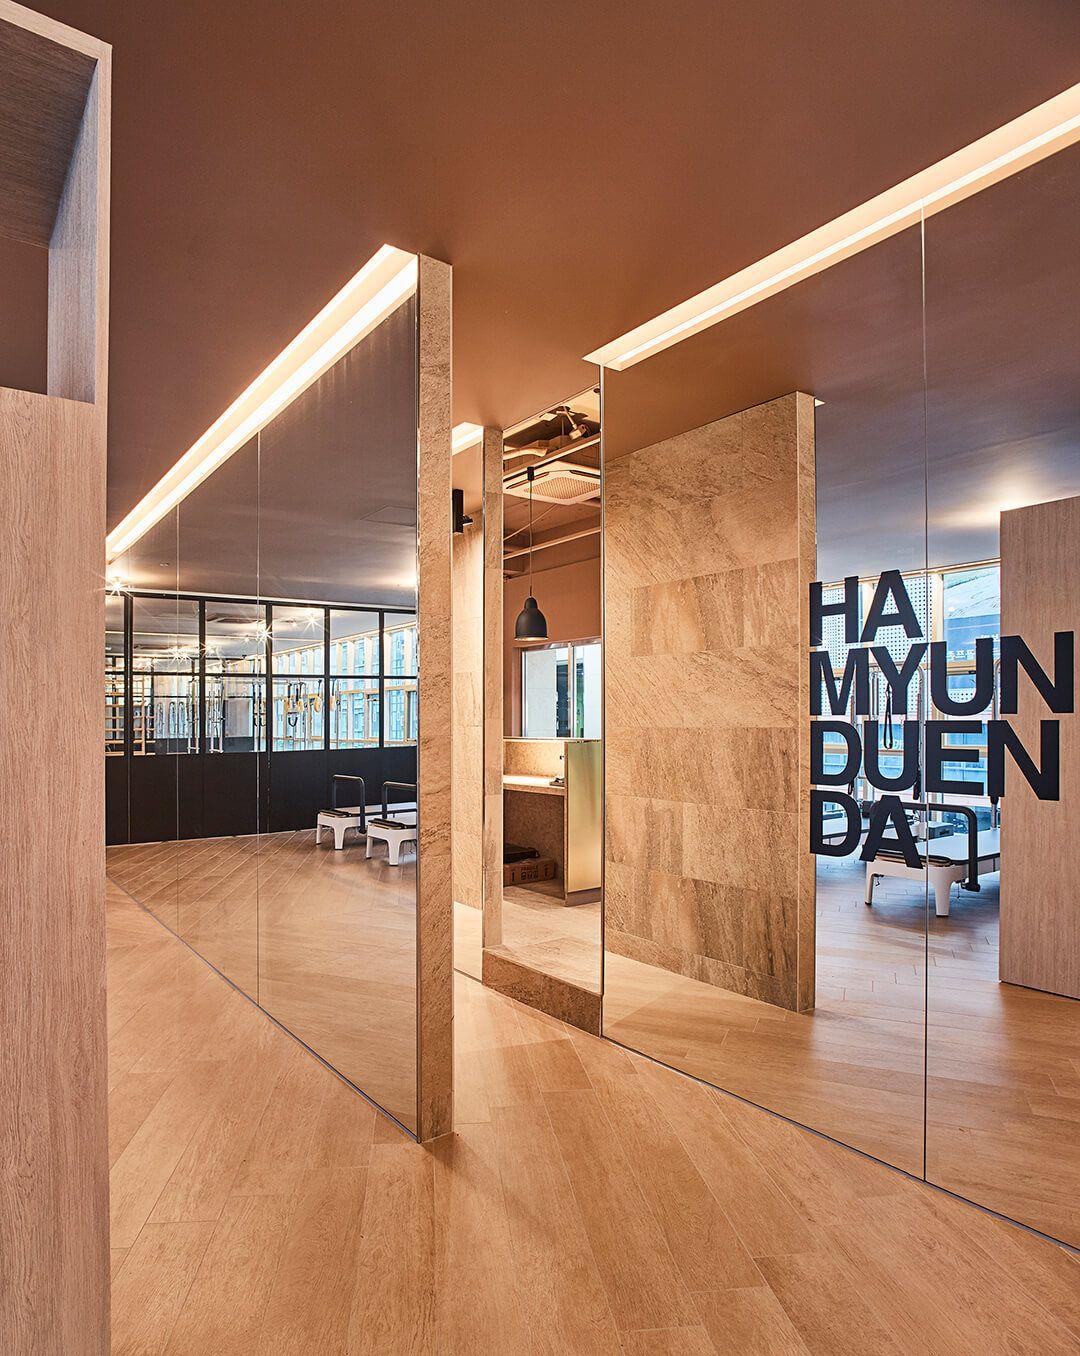 Vonsung designs with balance in a pilates studio | Pilates studio ...